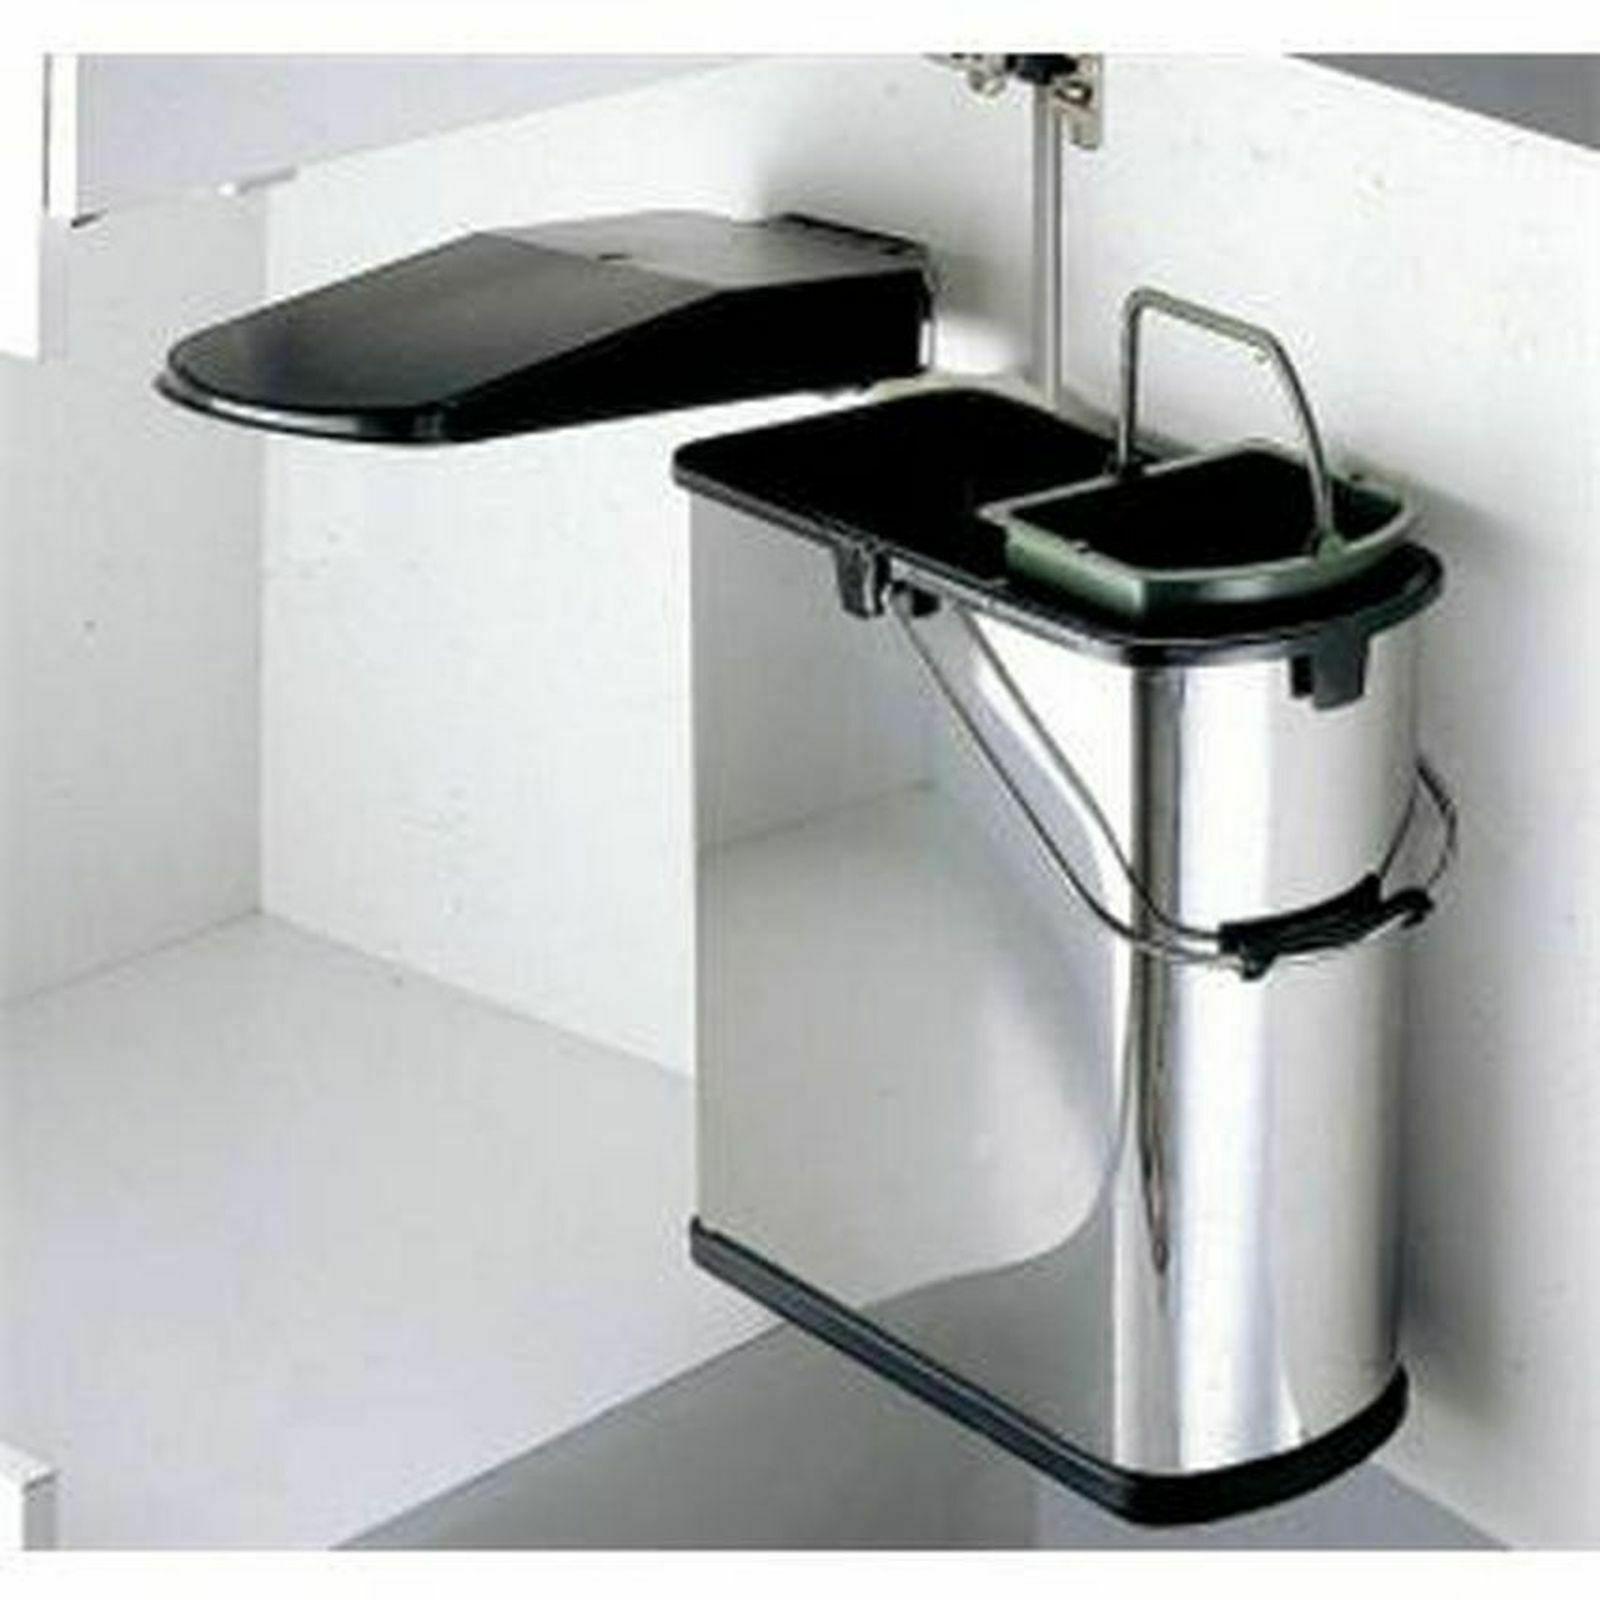 Mülleimer Küche Wesco Abfalleimer 19 L Mülltrennung Bioeimer Mülltrenner  *514915